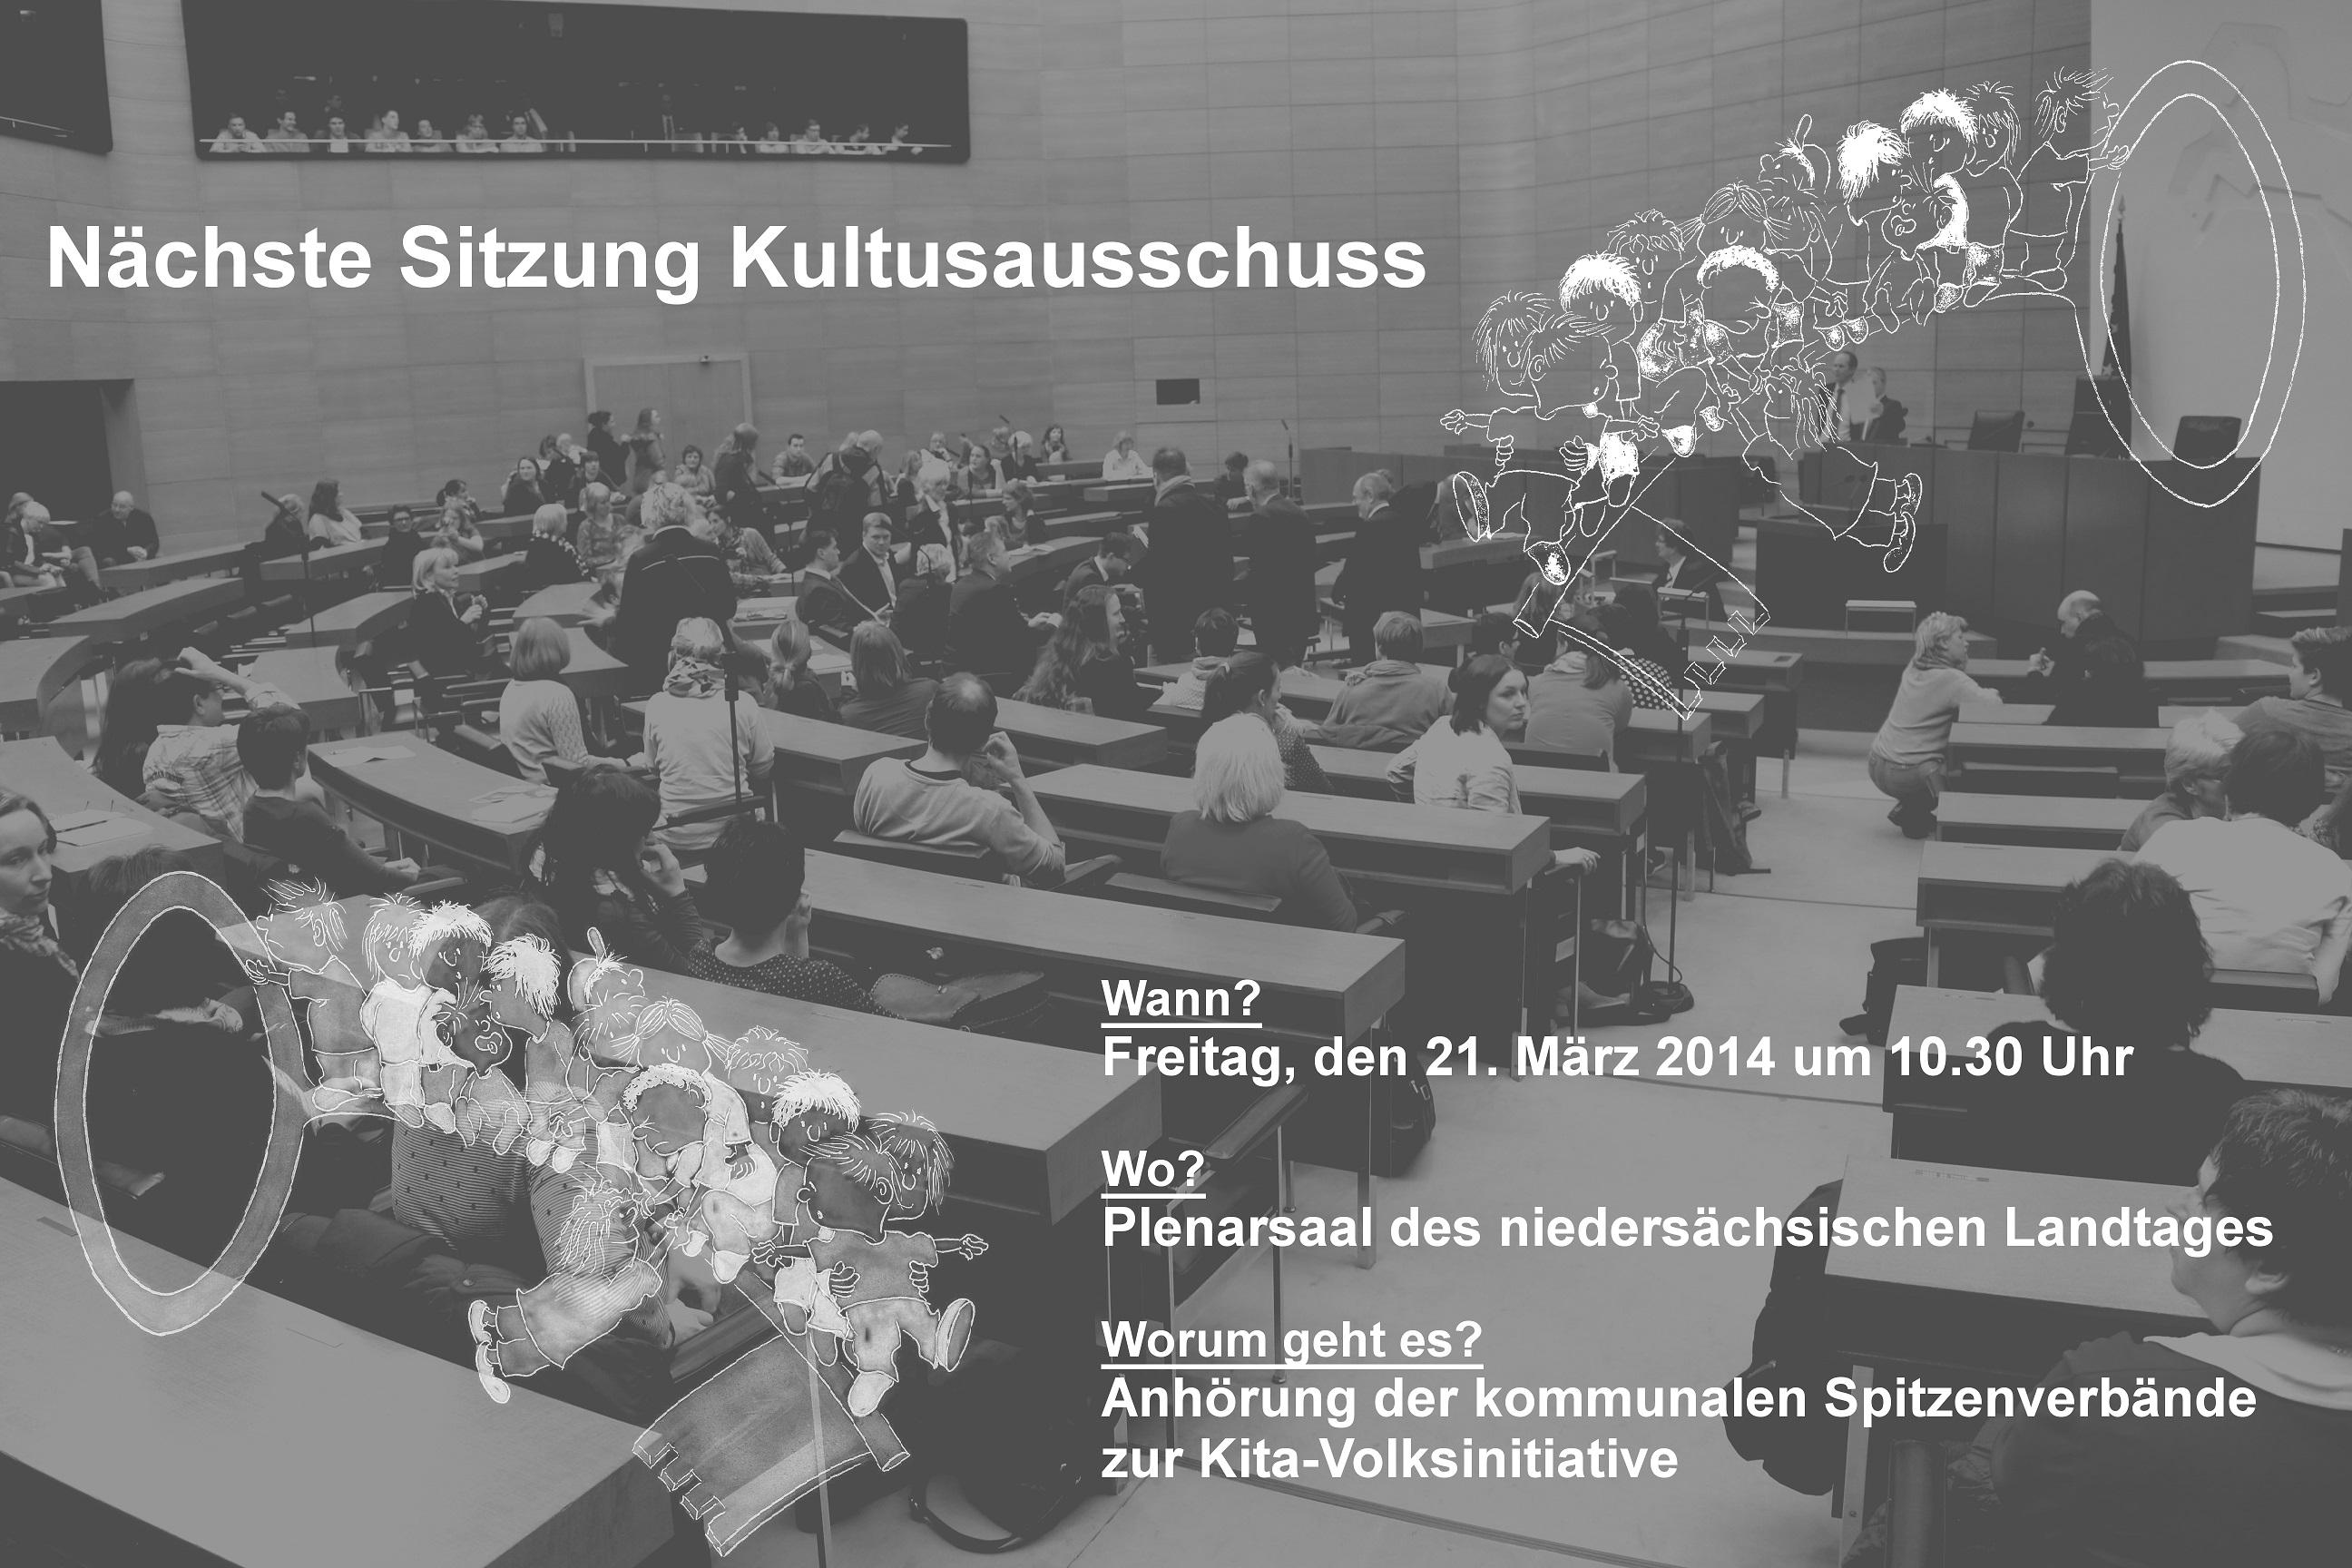 Aufruf Kultusausschuss 21. März 2014 - Internet